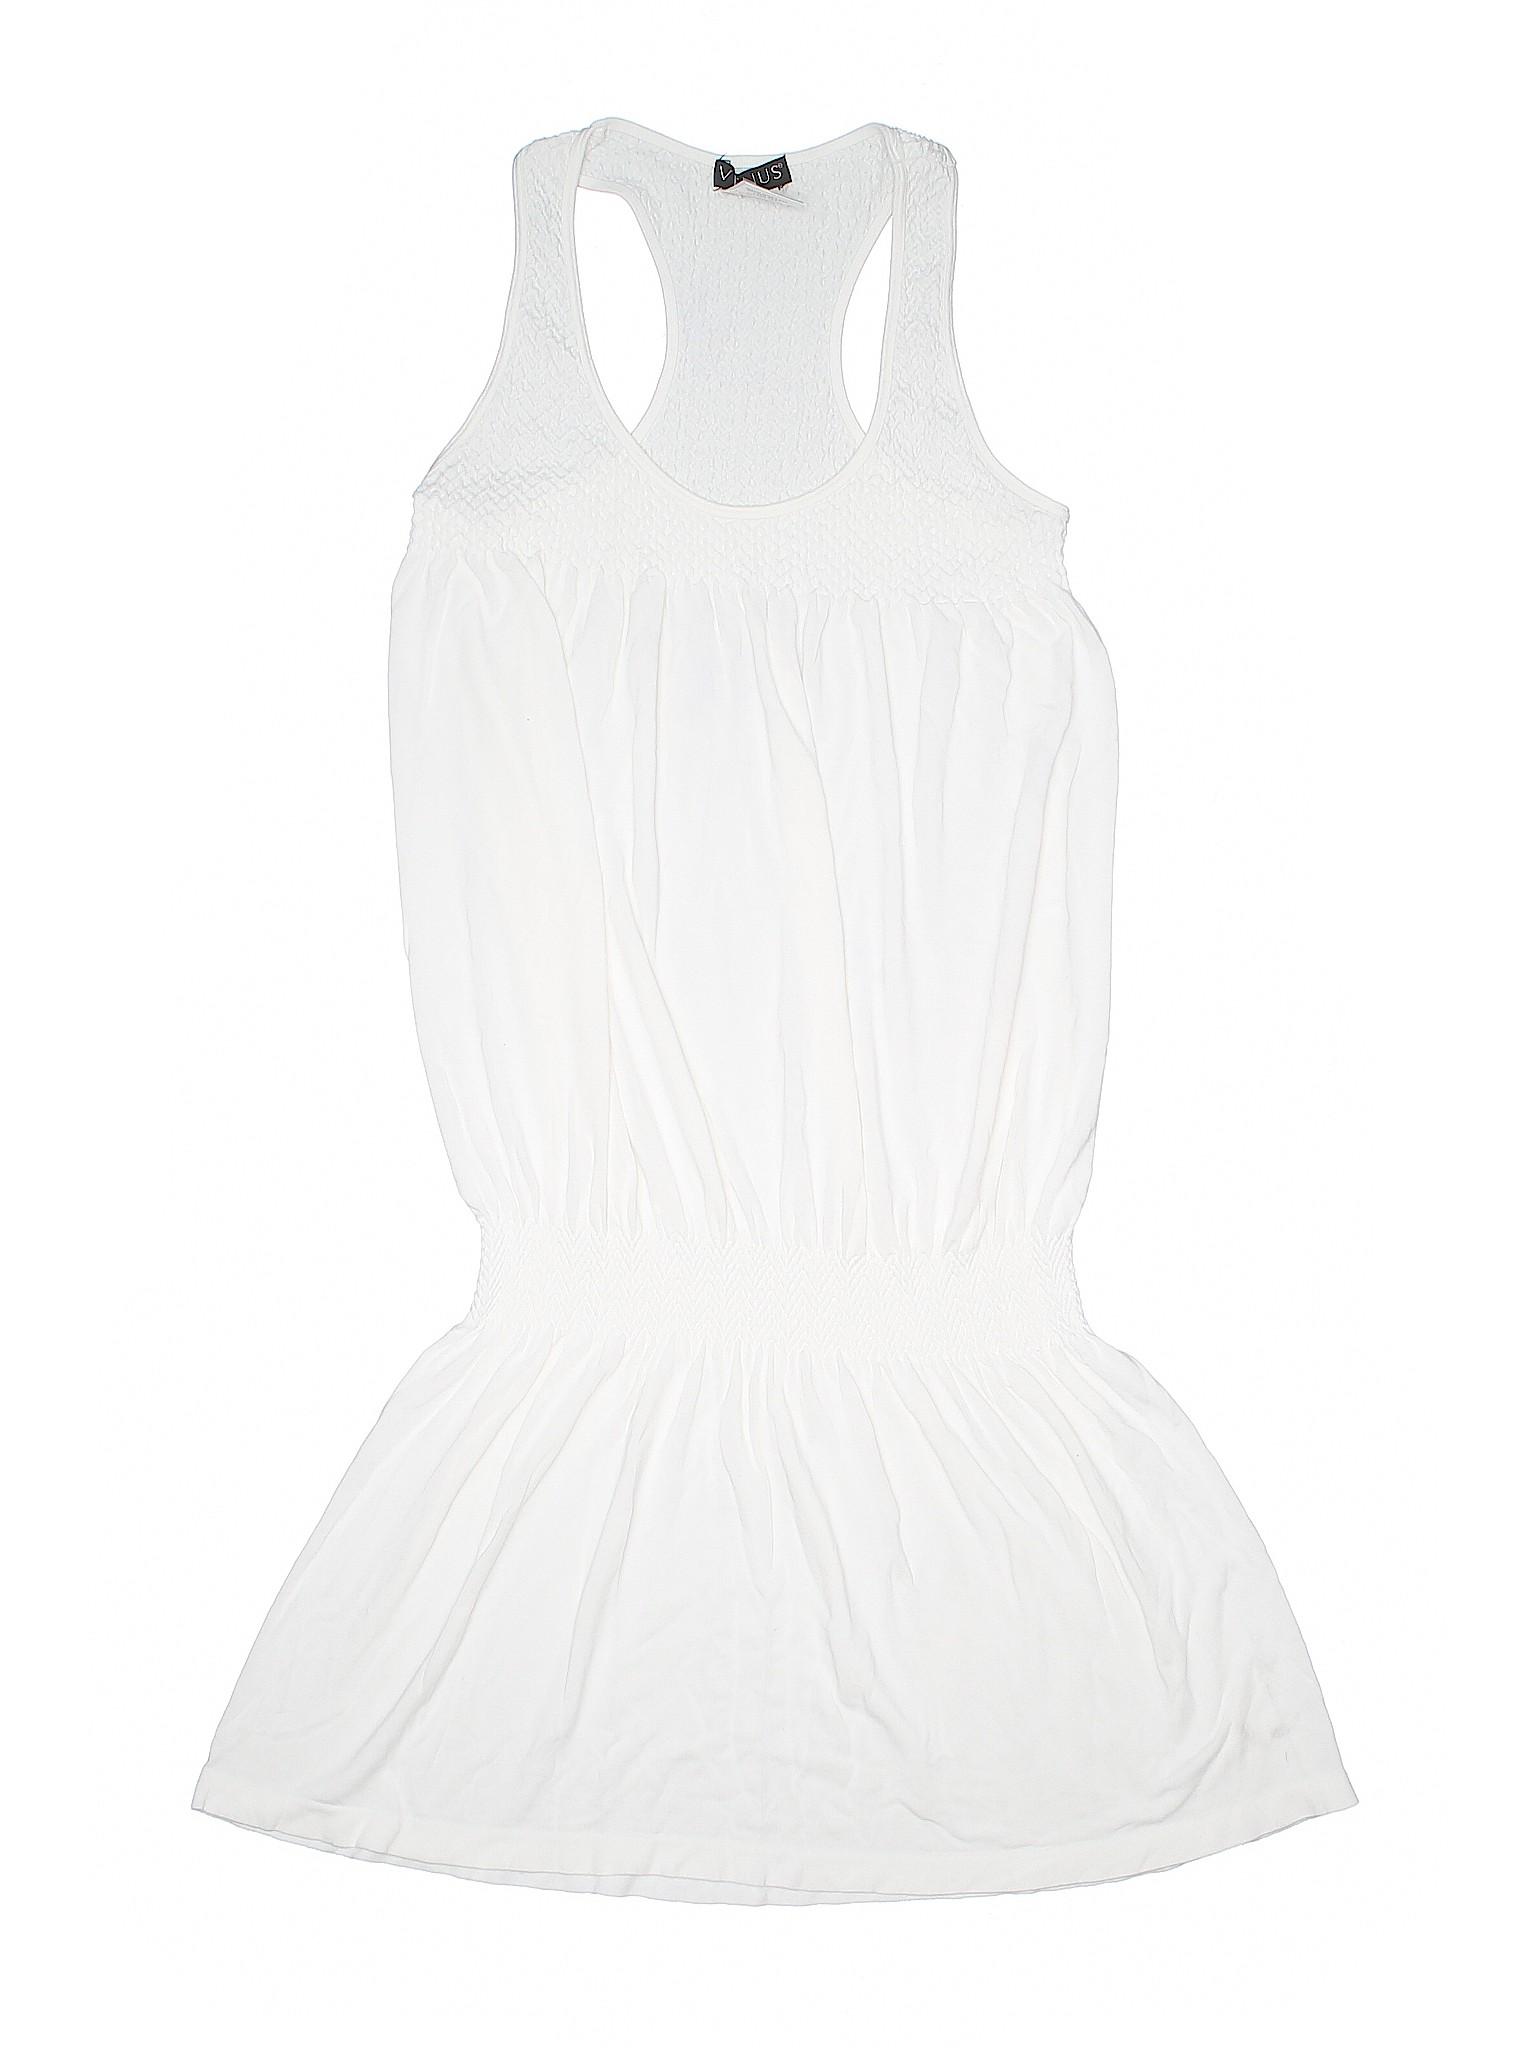 Swimsuit Venus Venus Venus Swimsuit Cover Swimsuit Cover Boutique Up Boutique Up Cover Up Boutique gP5vqw